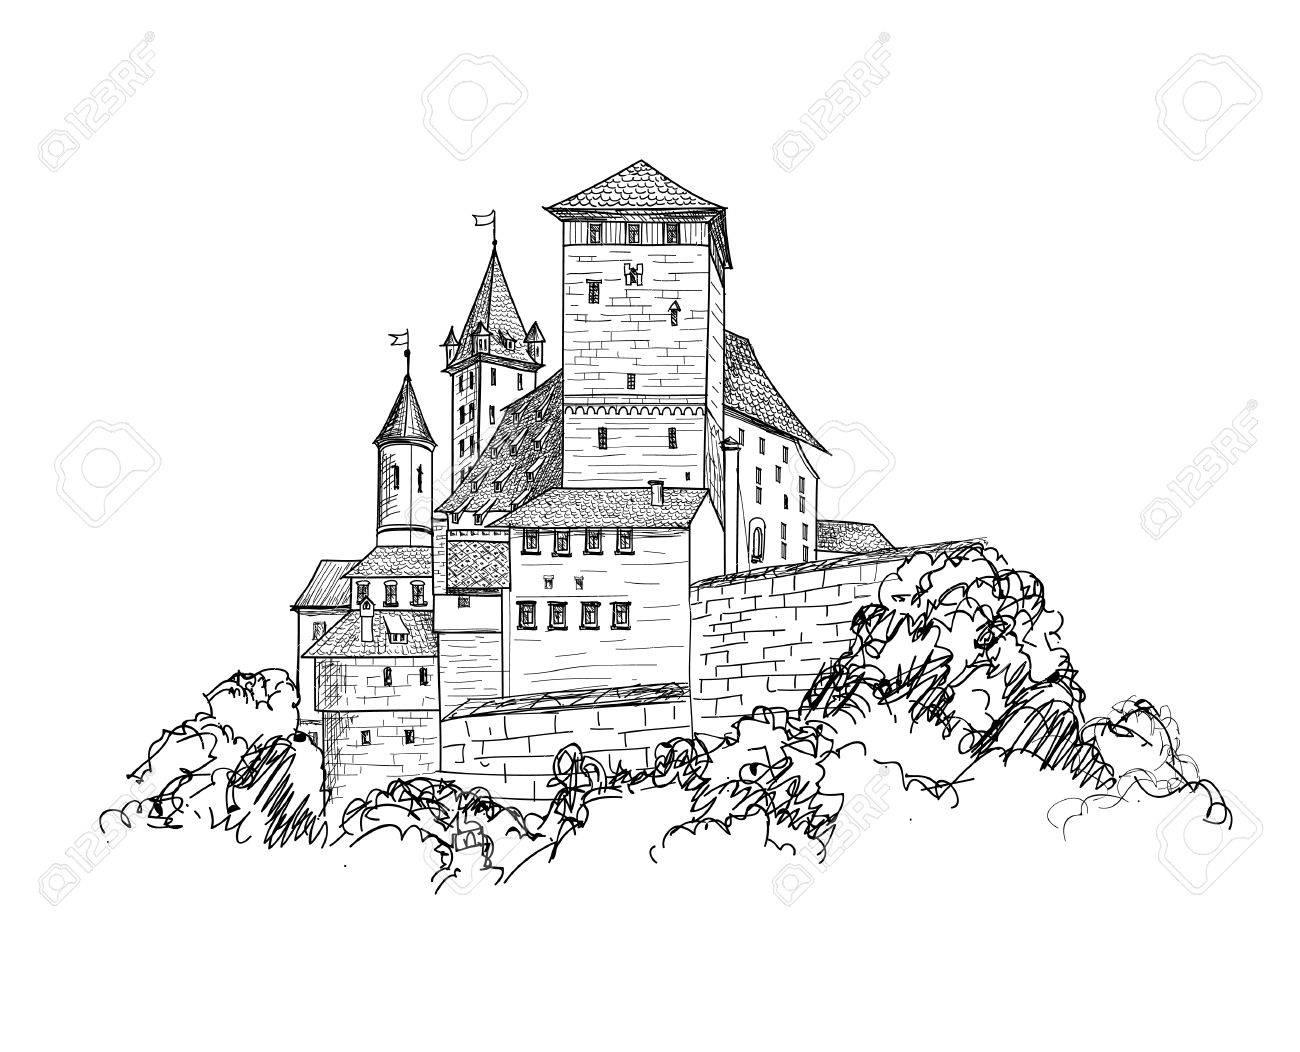 Ancient castle landscape engraving. Tower building sketch skyline - 75321257